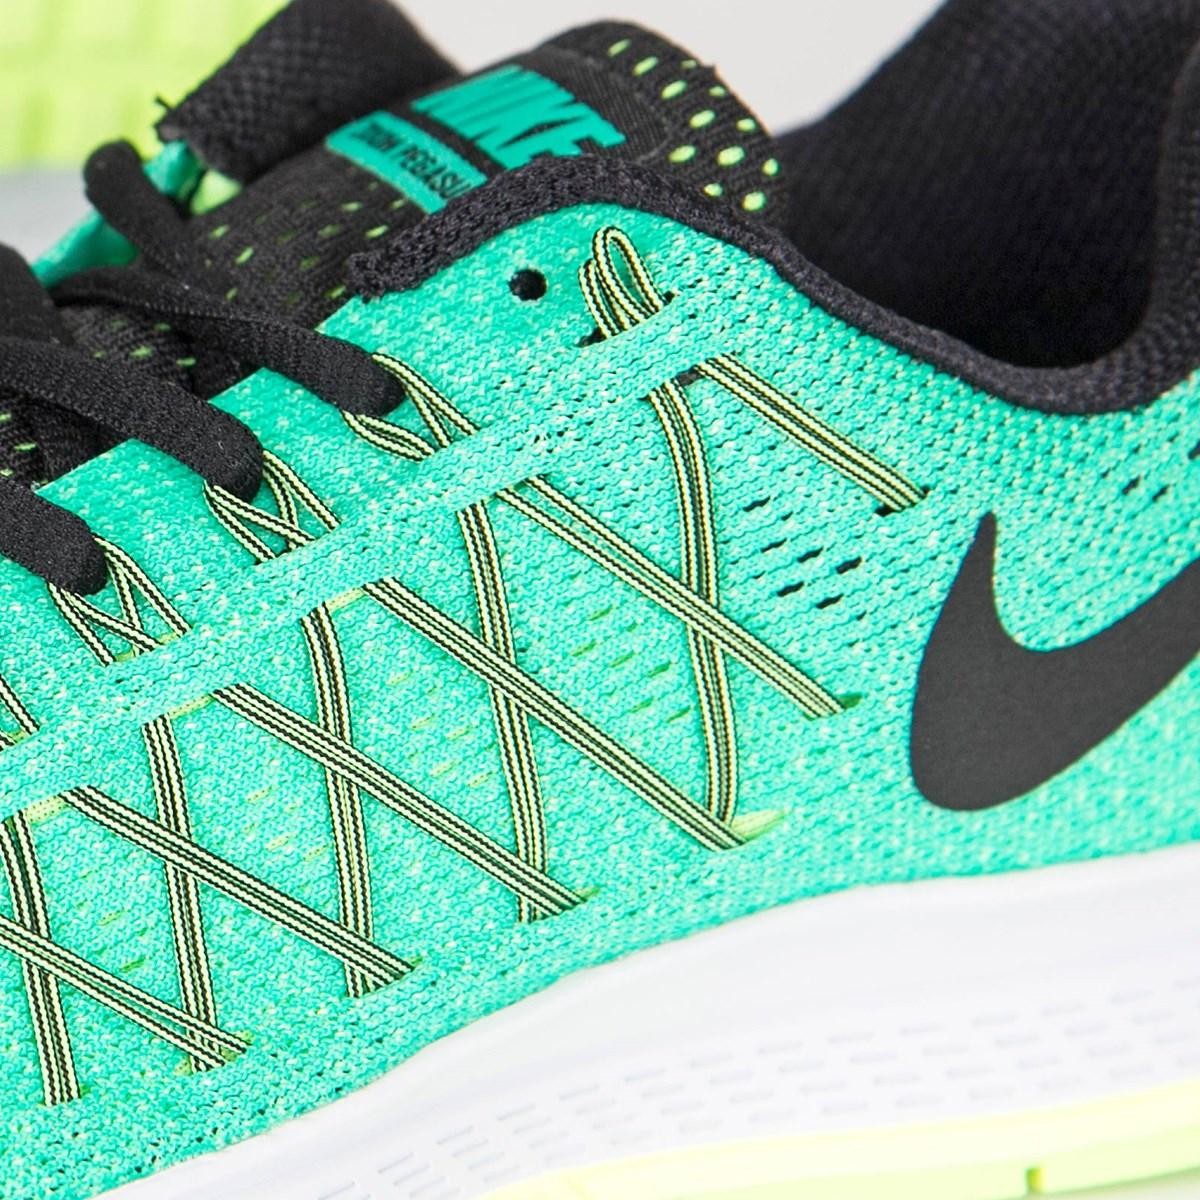 9cca7d681b30 Nike Wmns Air Zoom Pegasus 32 - 749344-303 - Sneakersnstuff ...